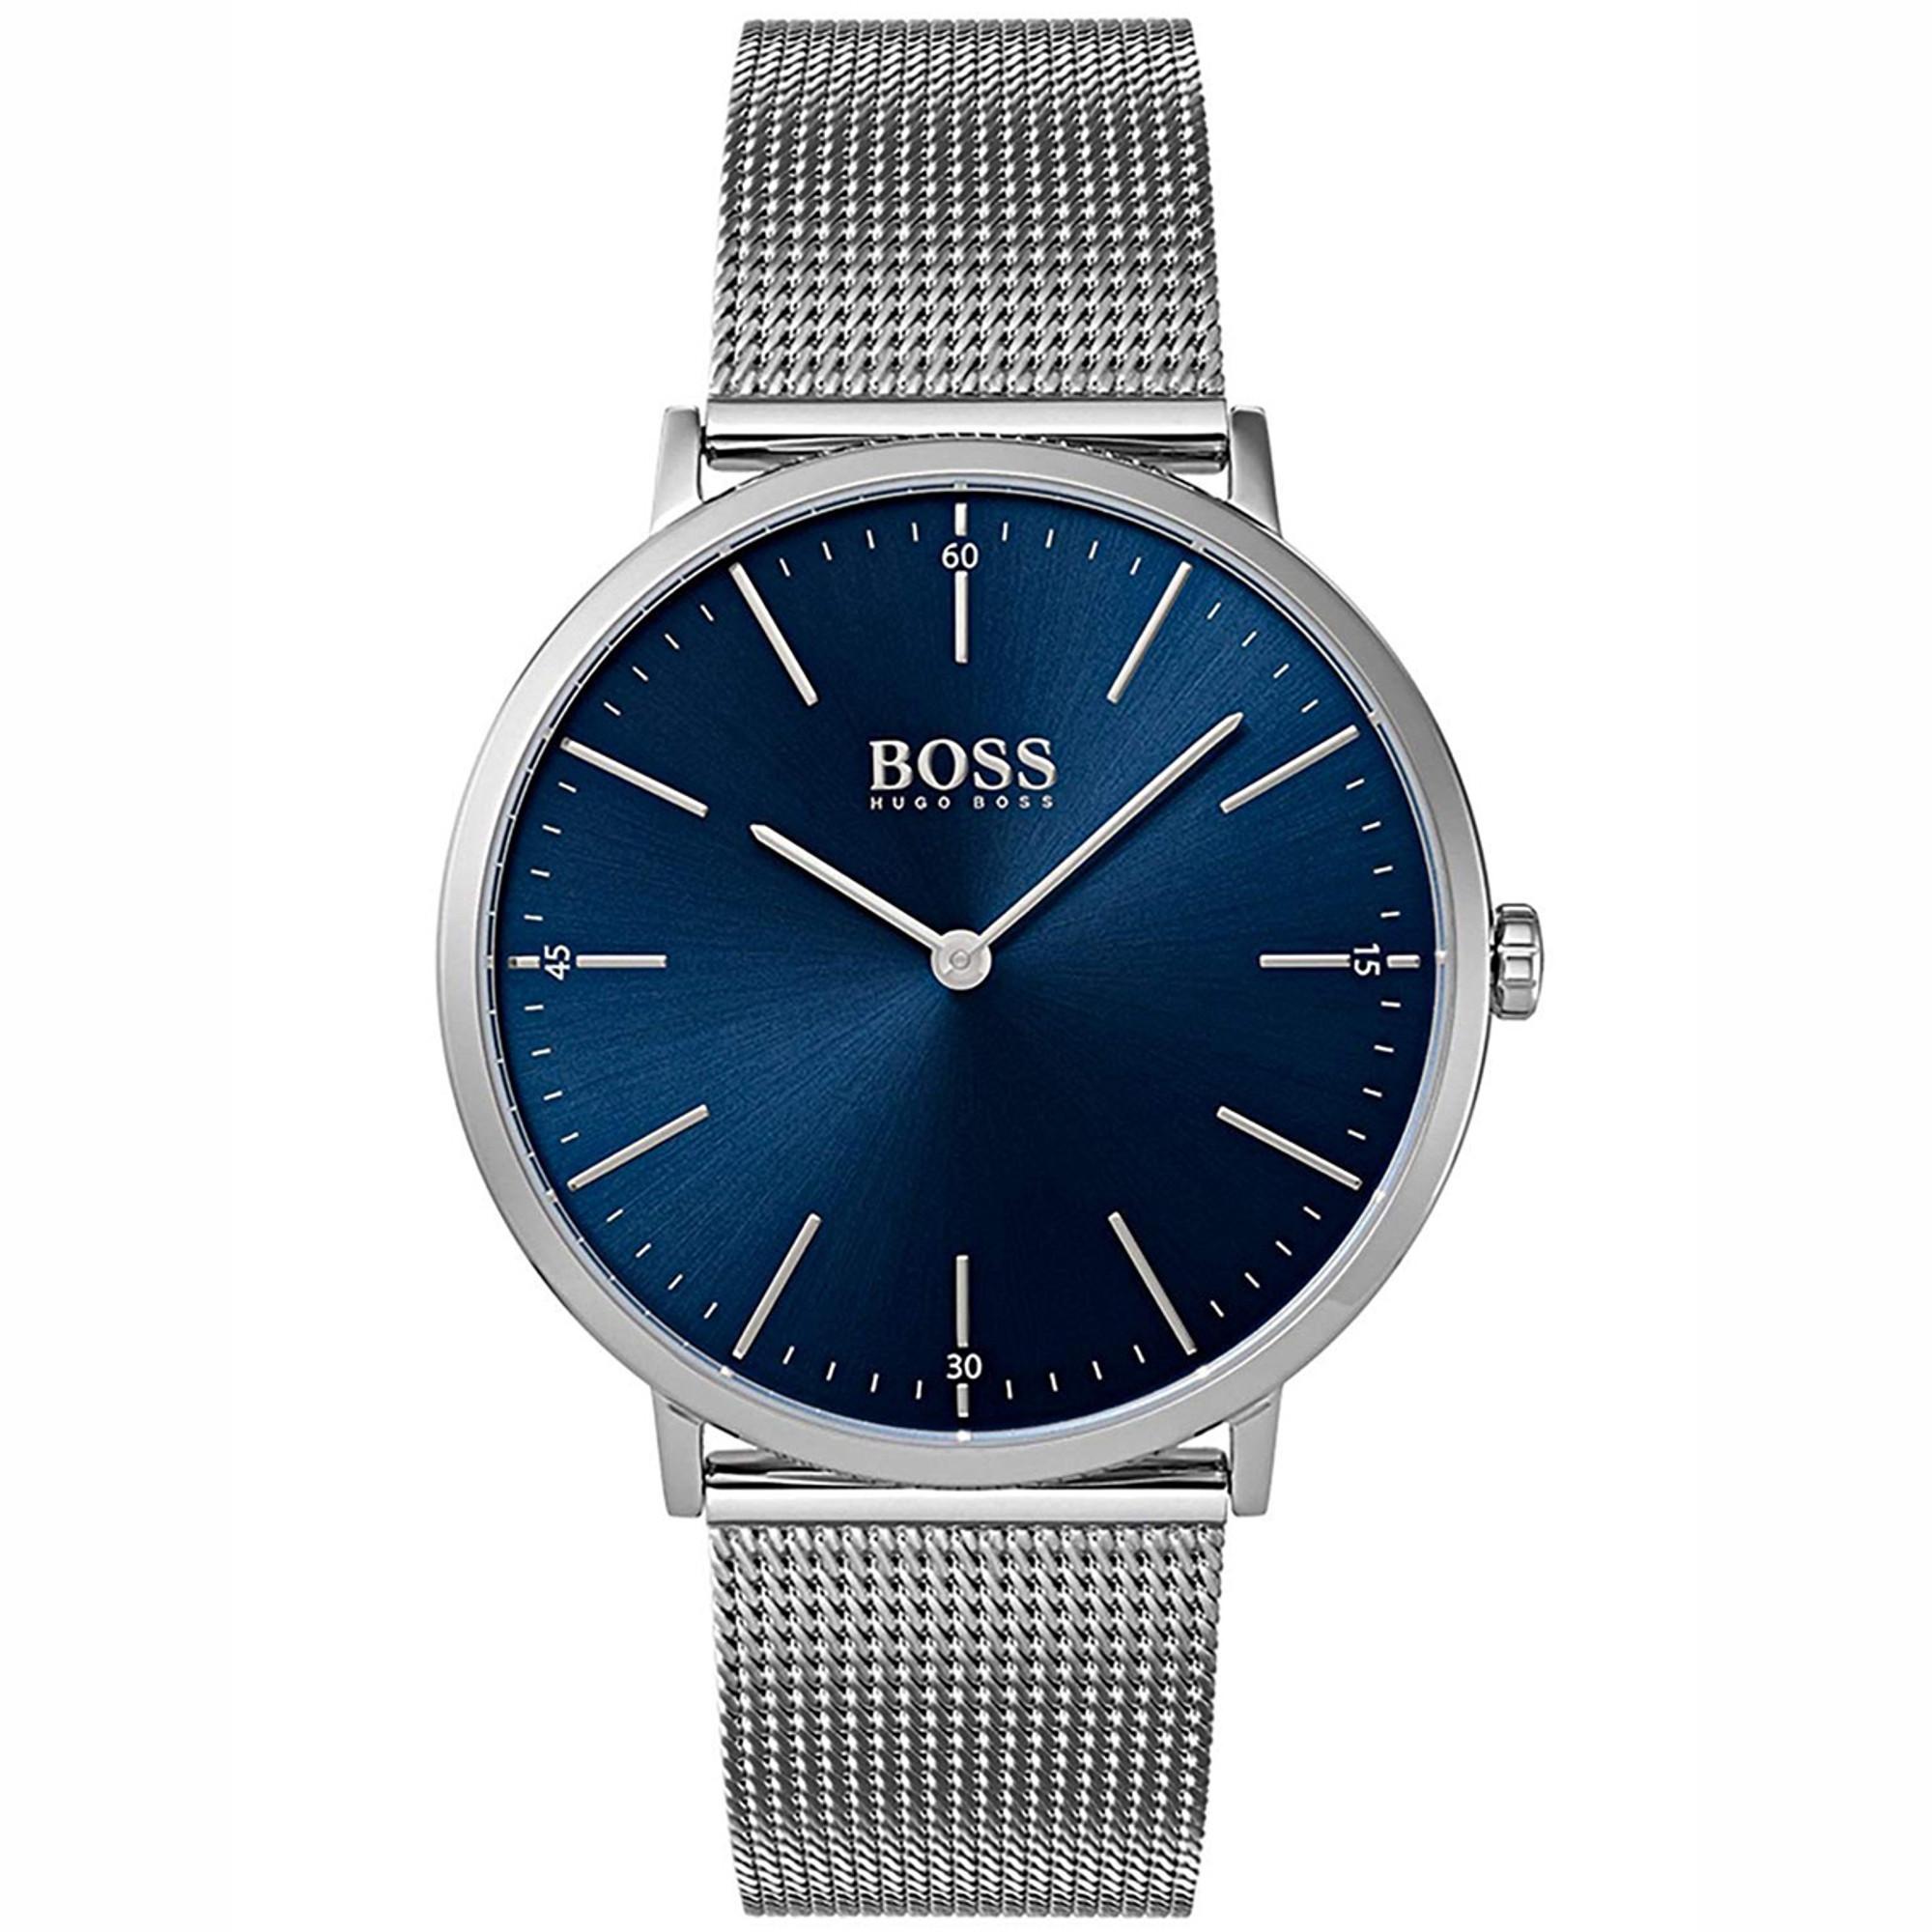 HUGO BOSS Horizon Quarz Armbanduhr 1513541